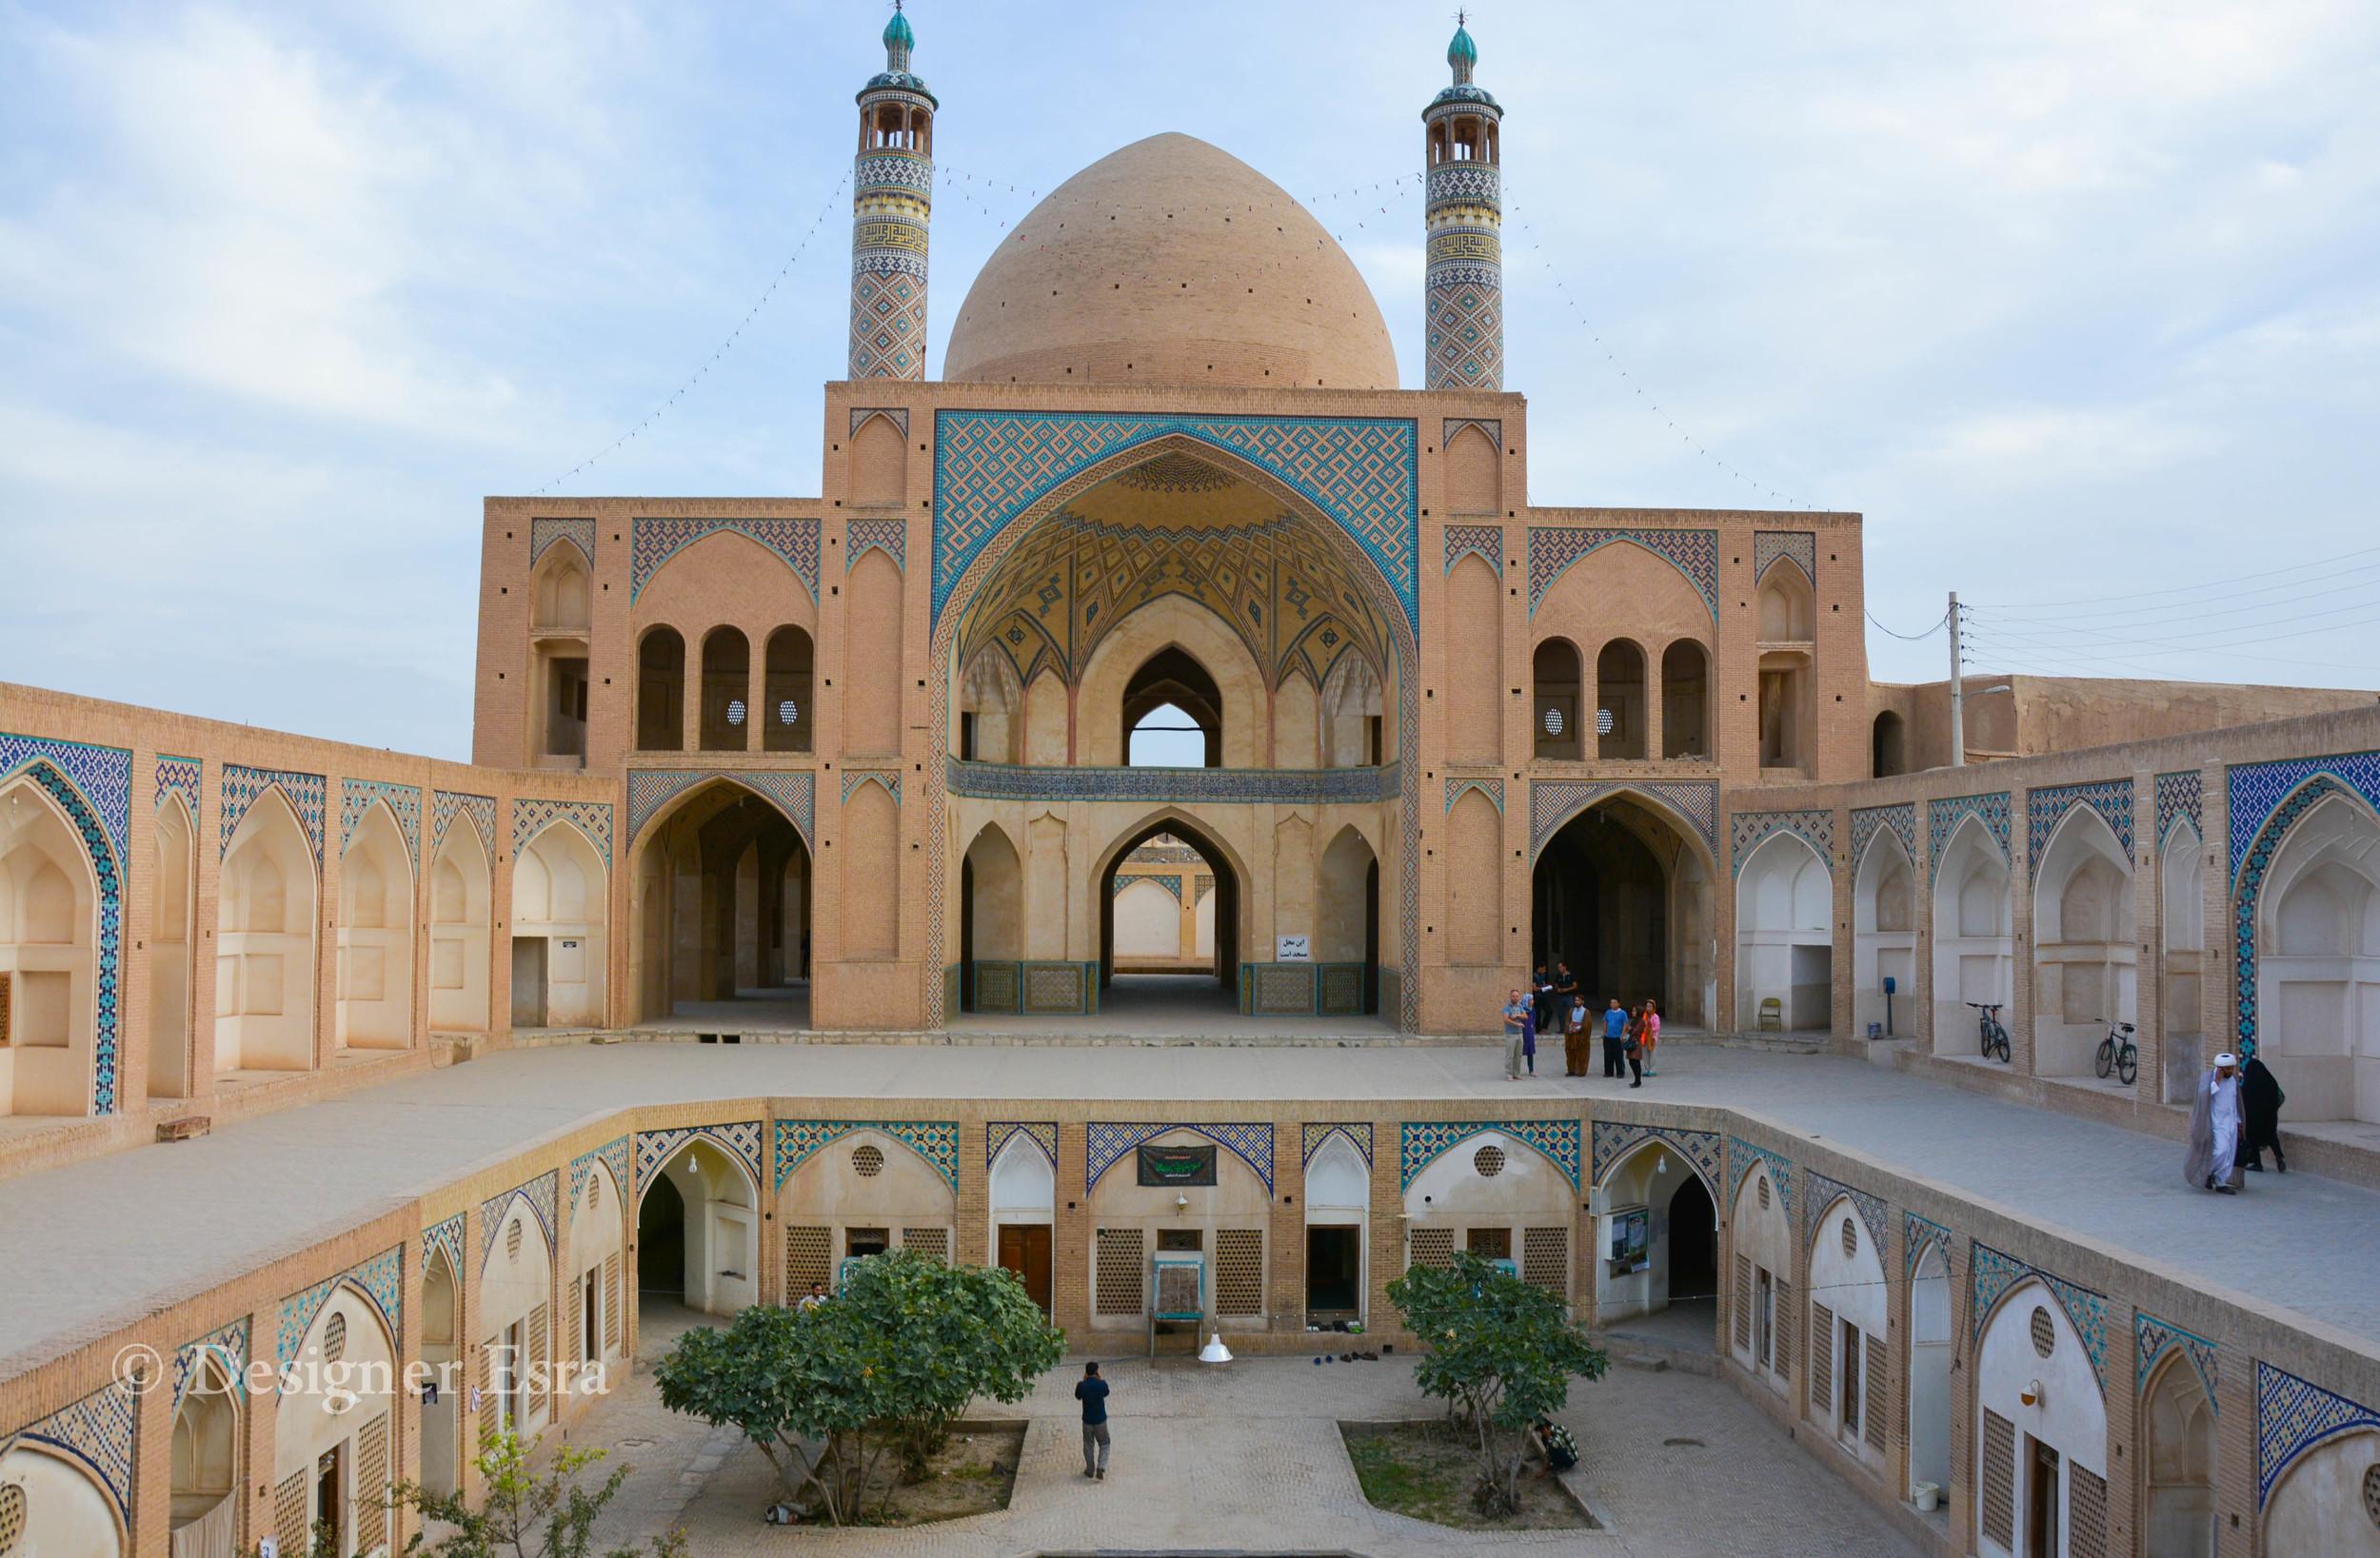 Agha Bozorg Mosque in Kashan, Iran